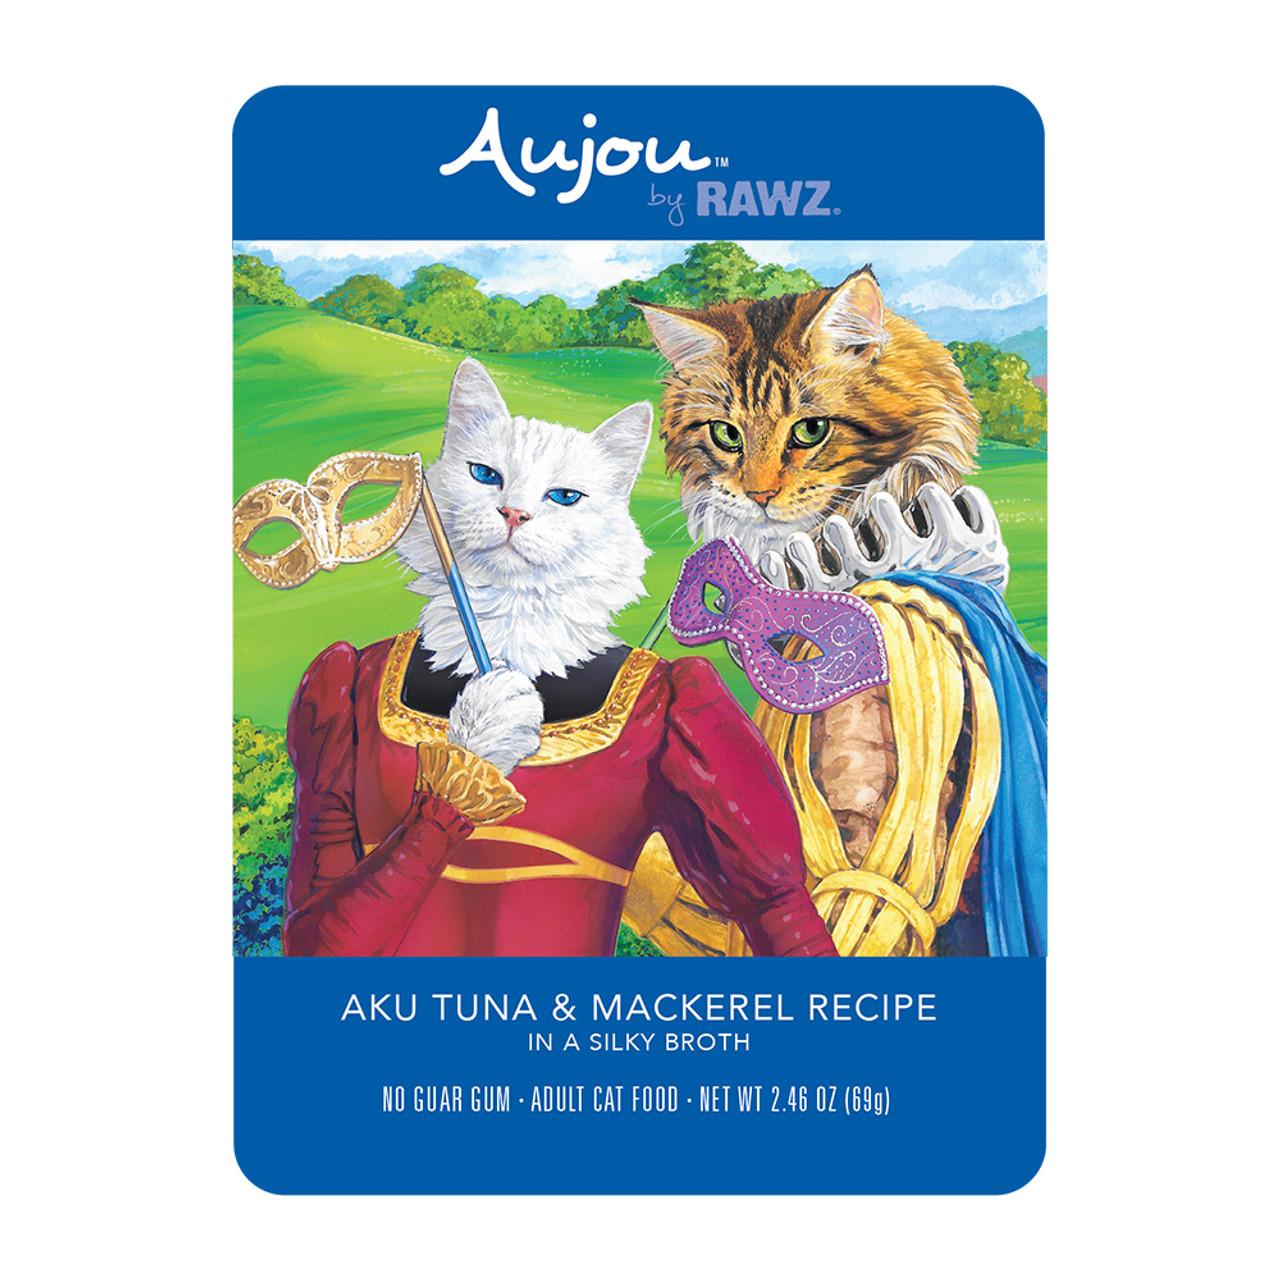 RAWZ Aujou Aku Tuna & Mackerel Recipe Wet Cat Food - Front